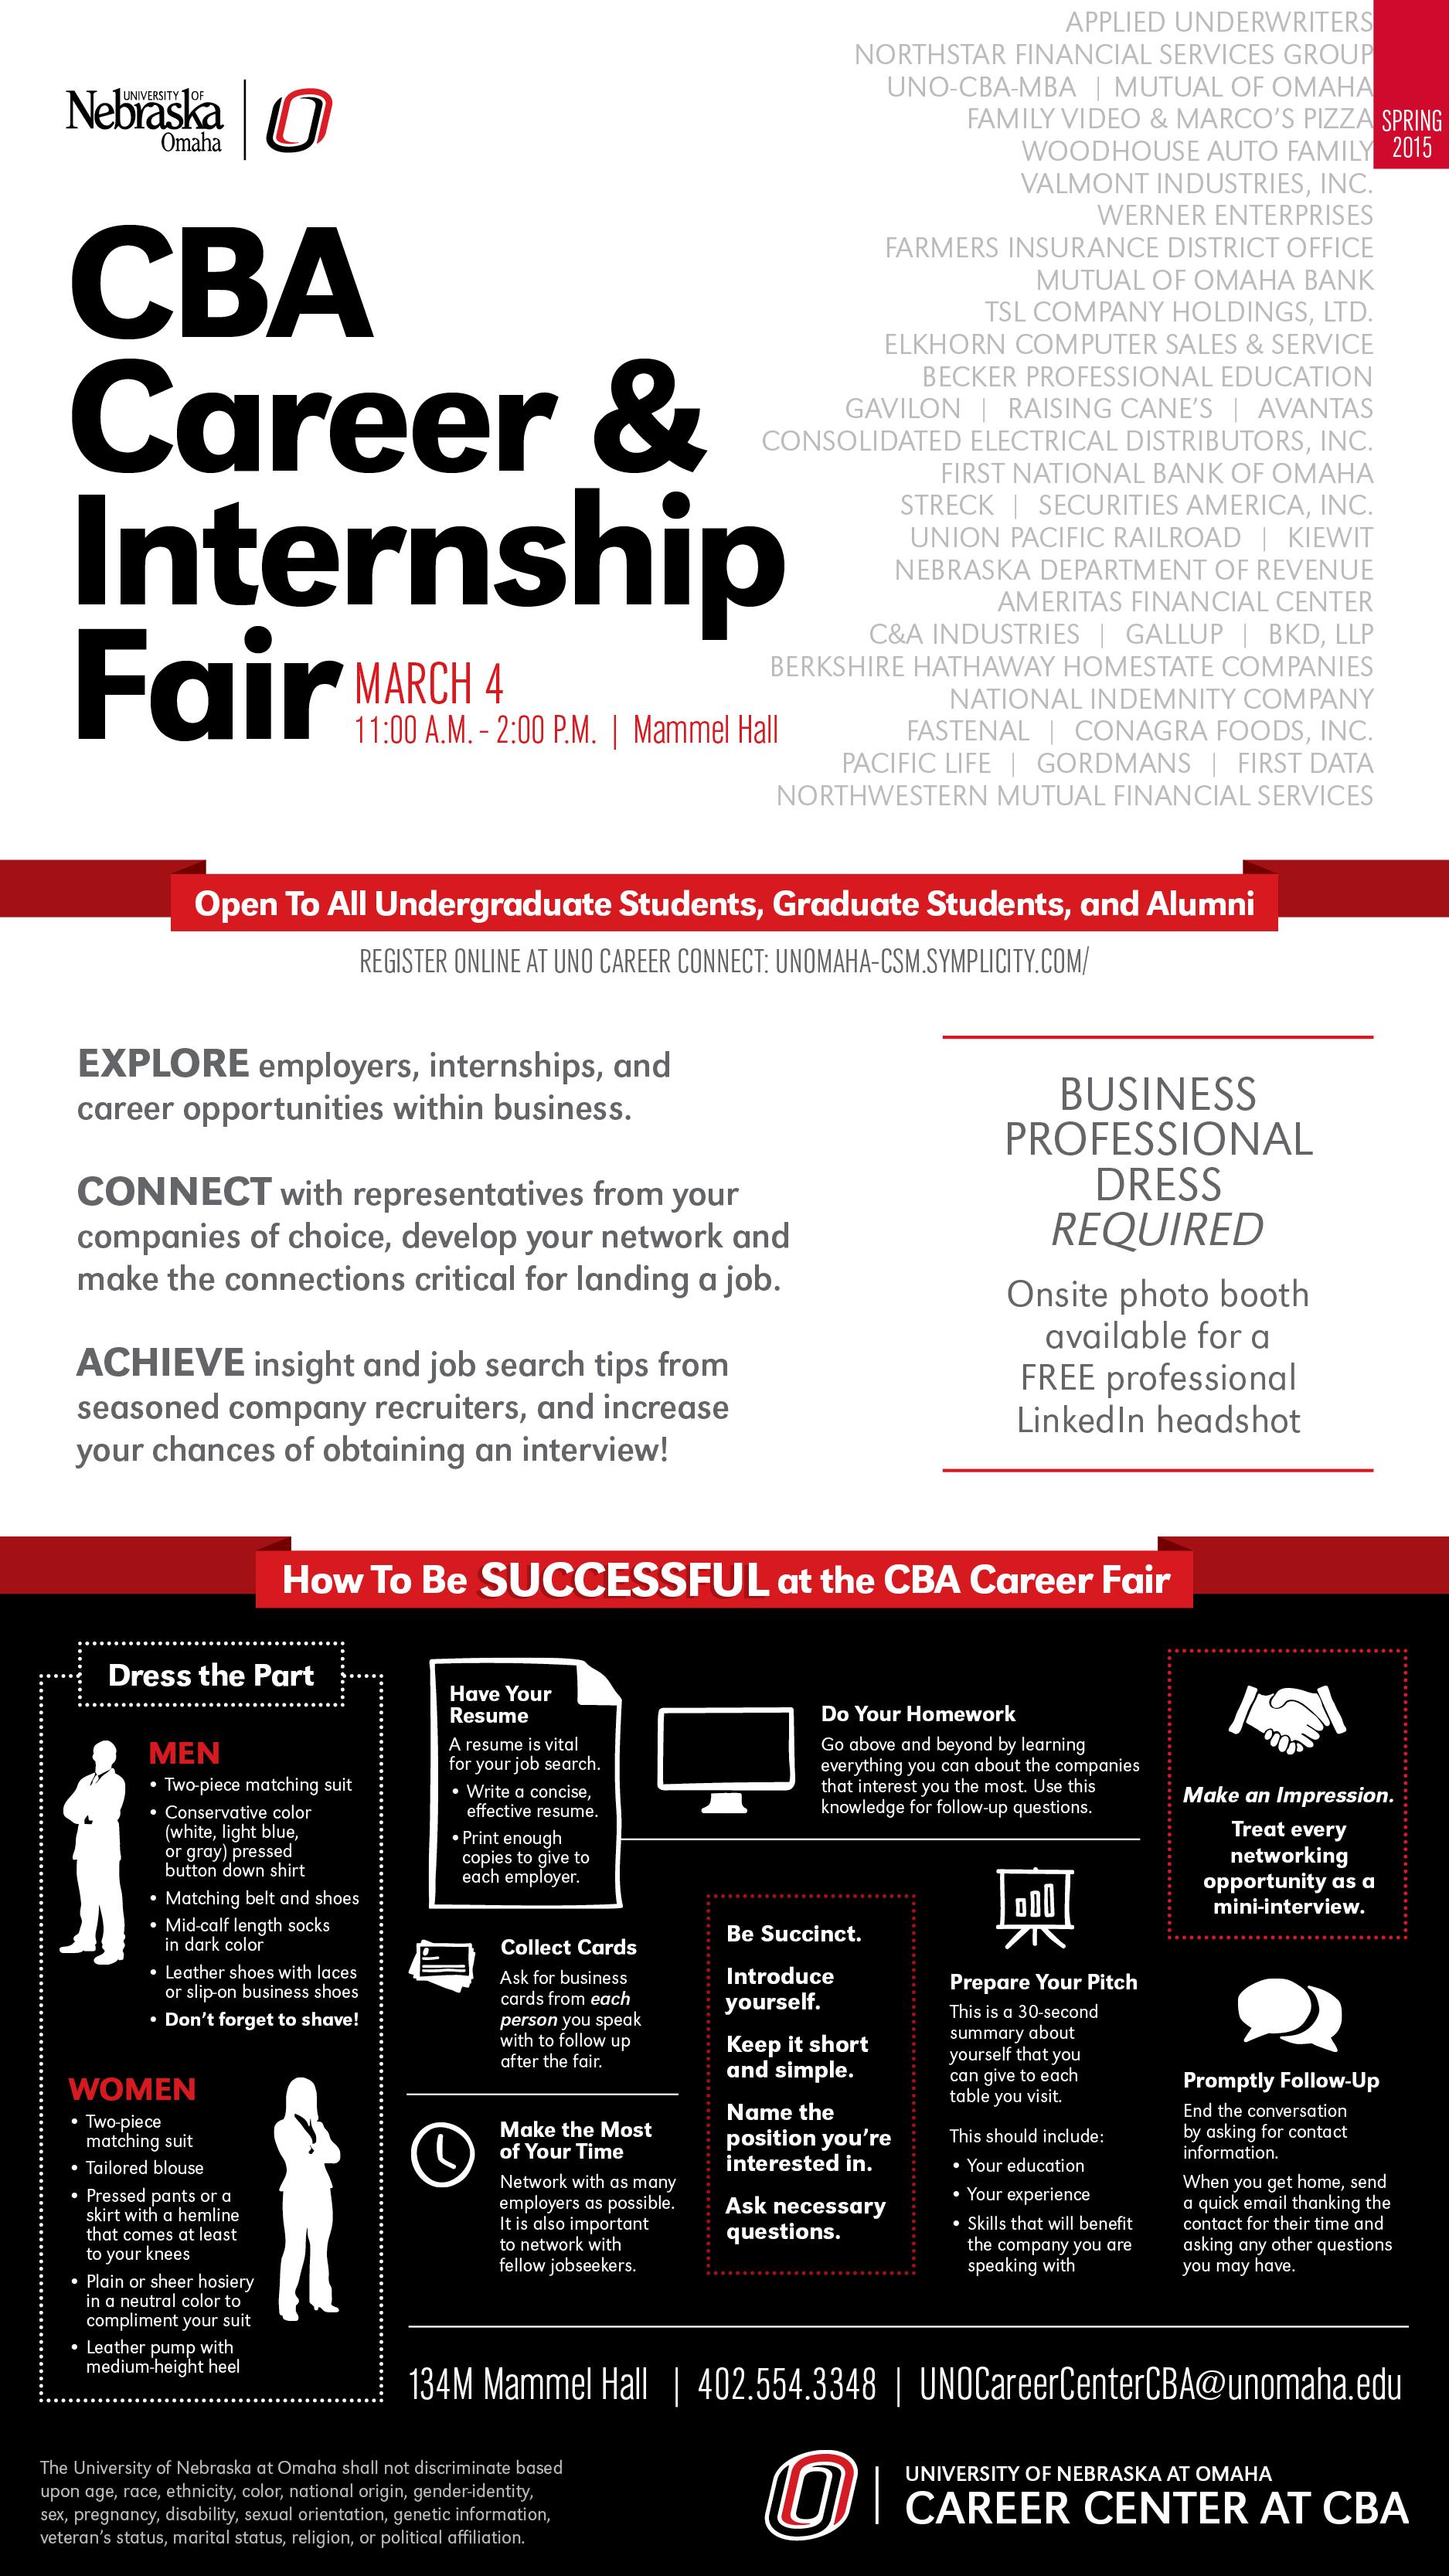 spring 2015 cba career internship fair college of business spring 2015 cba career internship fair